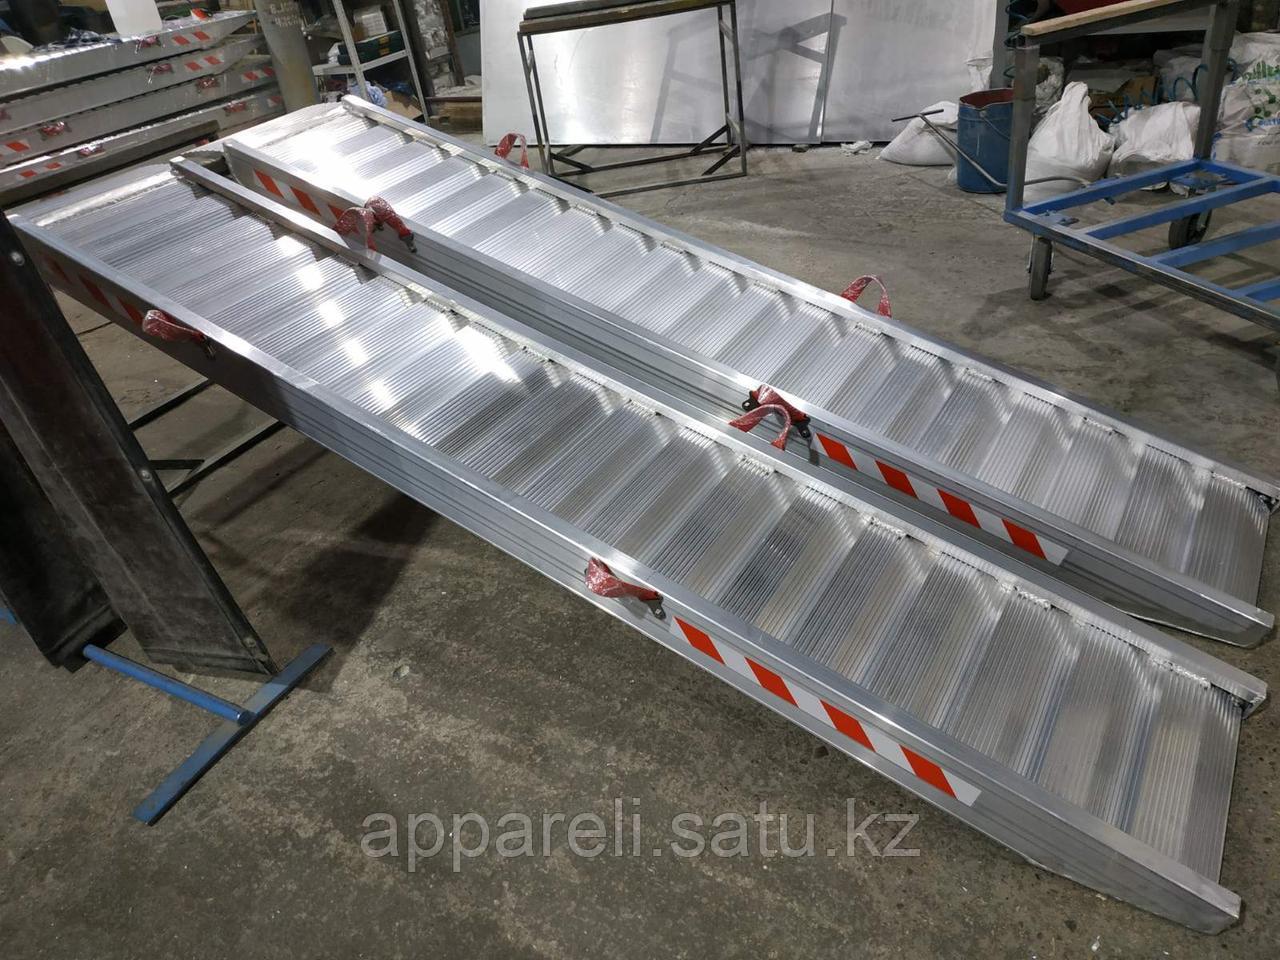 Алюминиевые аппарели от производителя 2,5 метра, 10 тонн